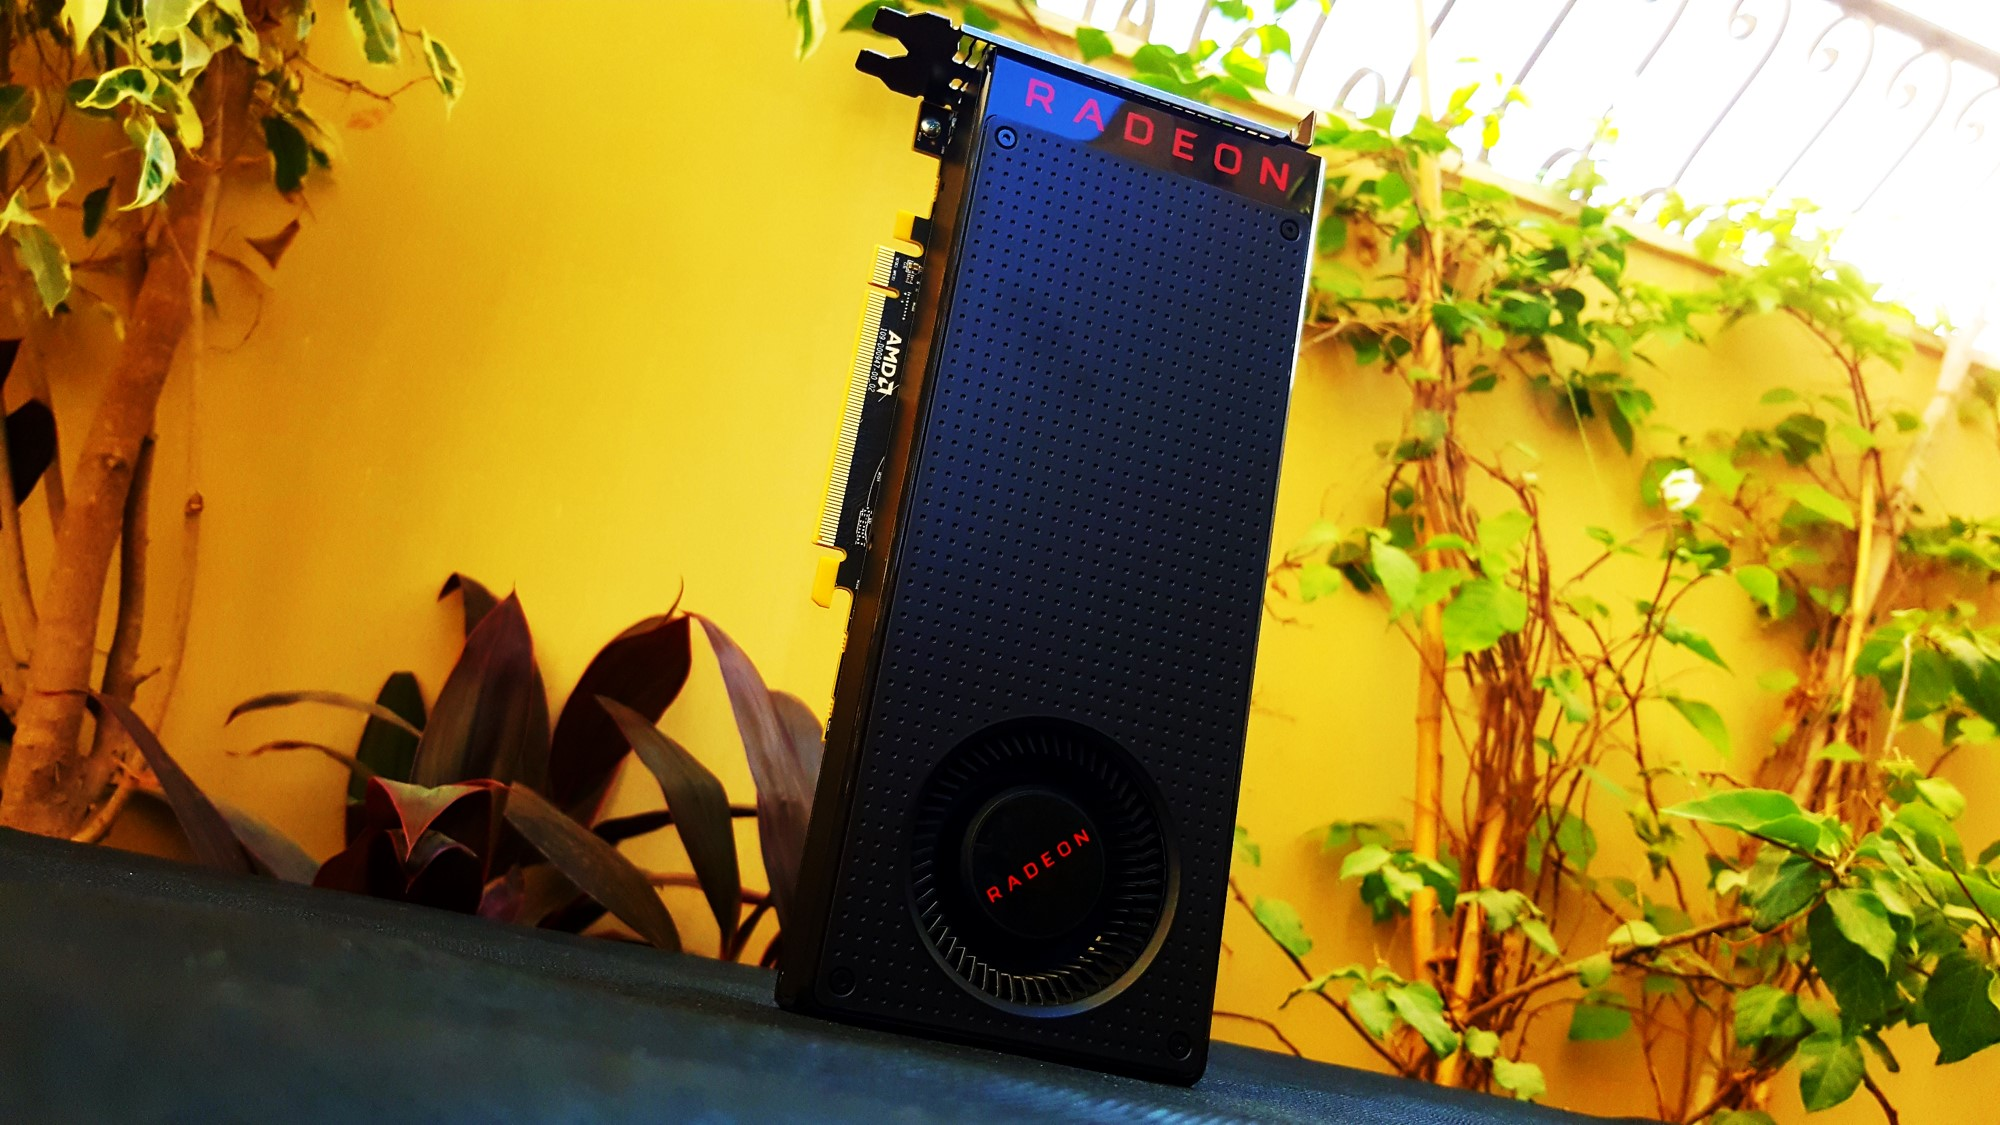 10-AMD Radeon RX 480